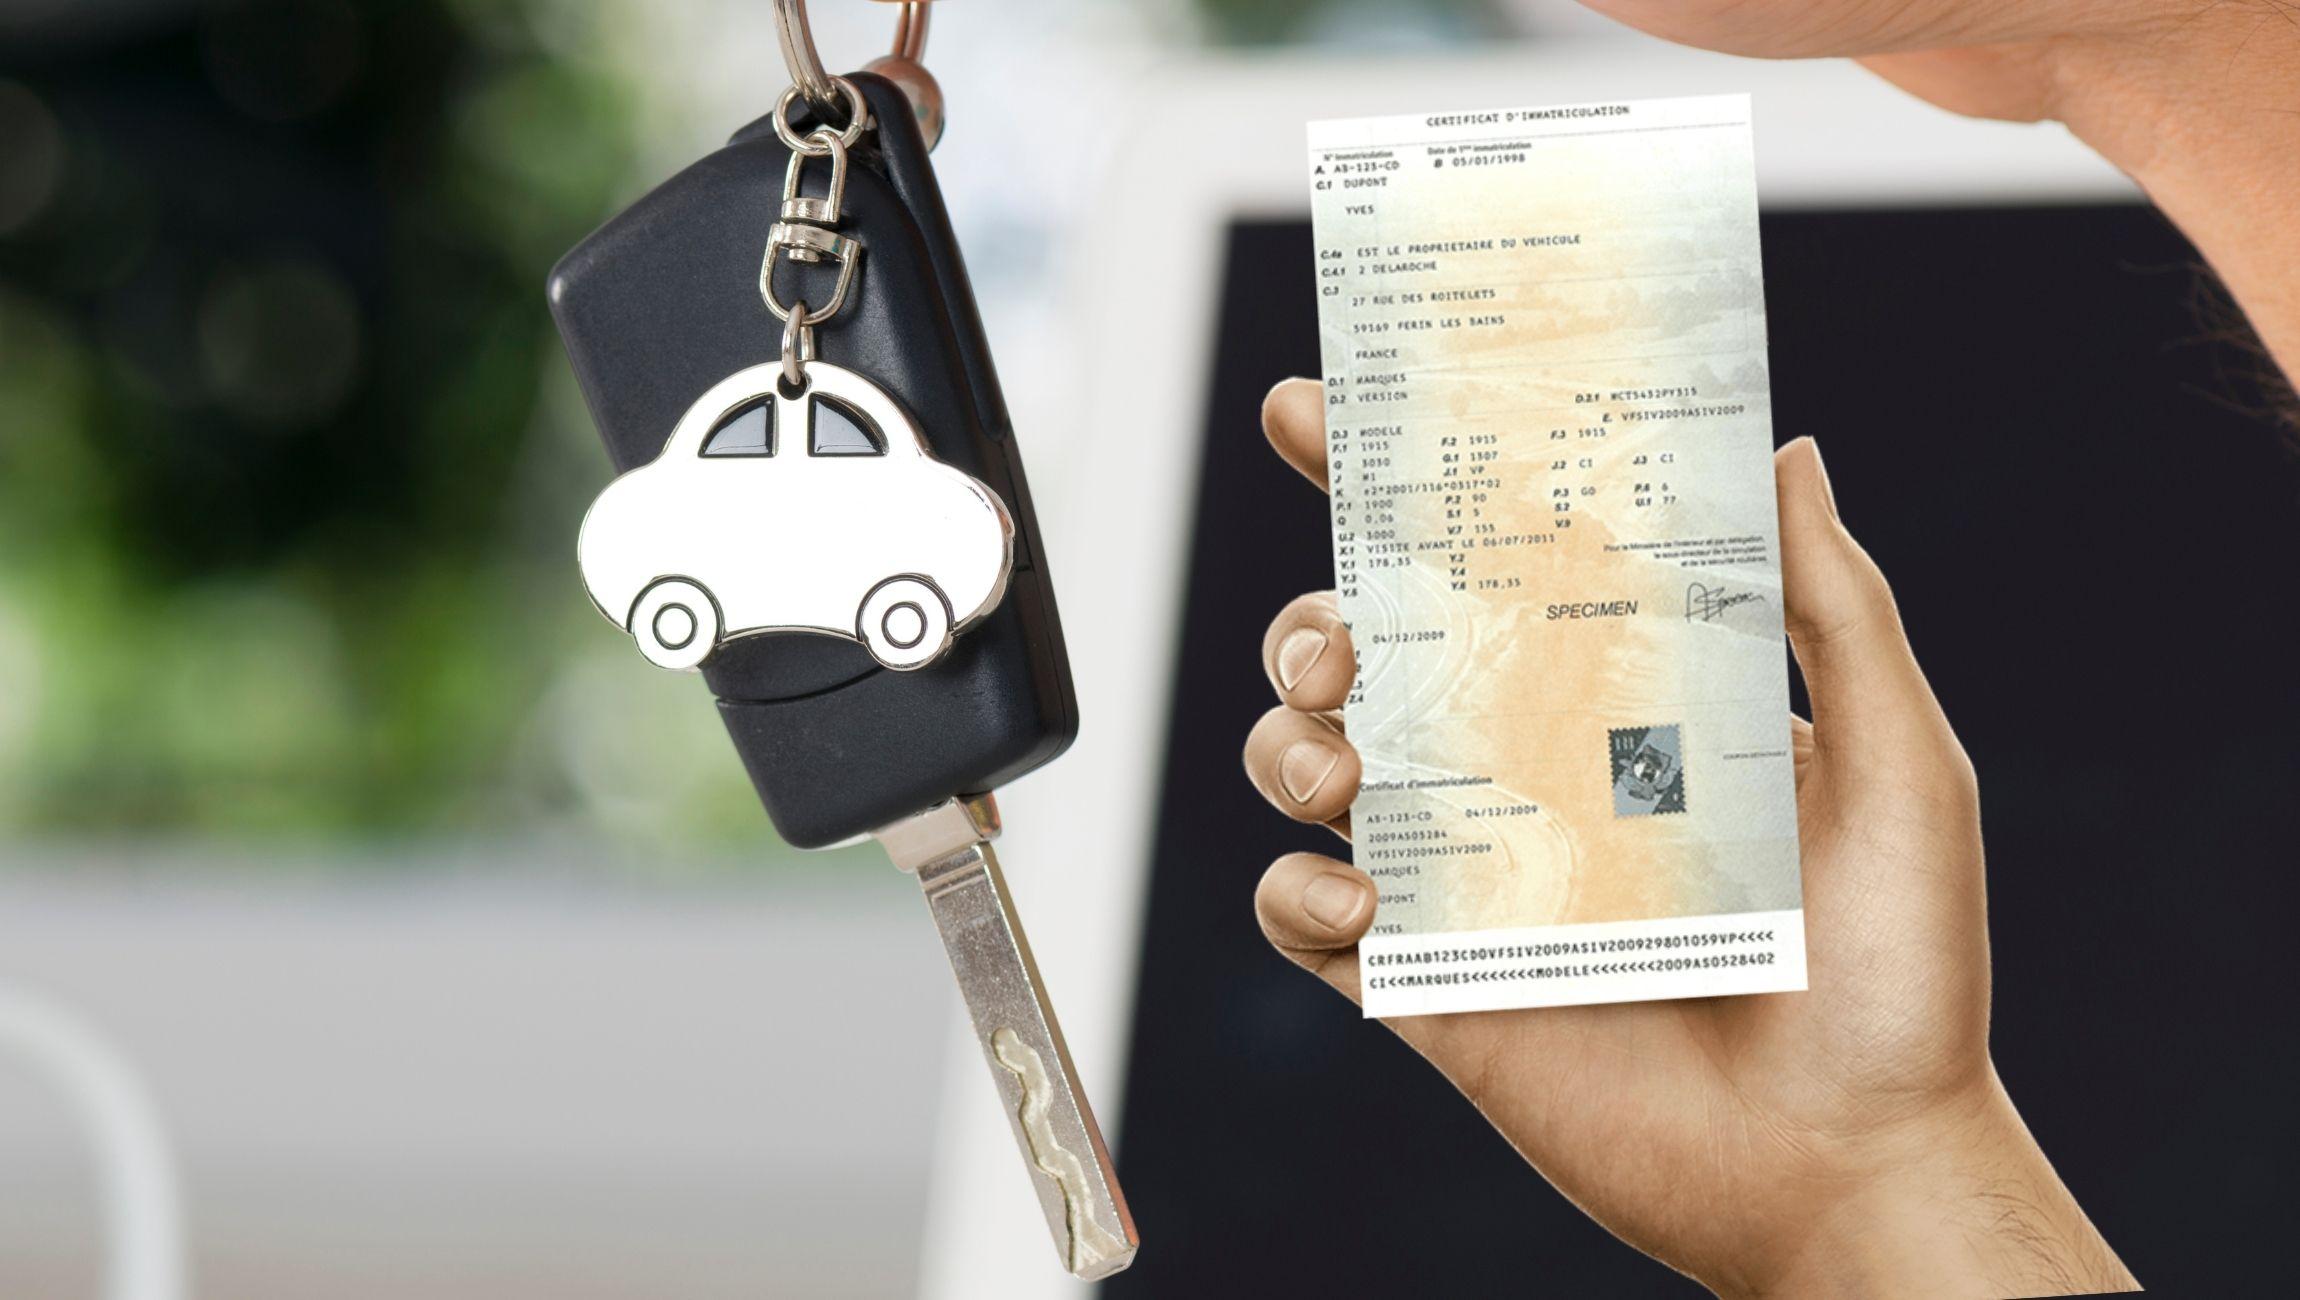 Faire immatriculer sa voiture : immatriculer un véhicule occasion